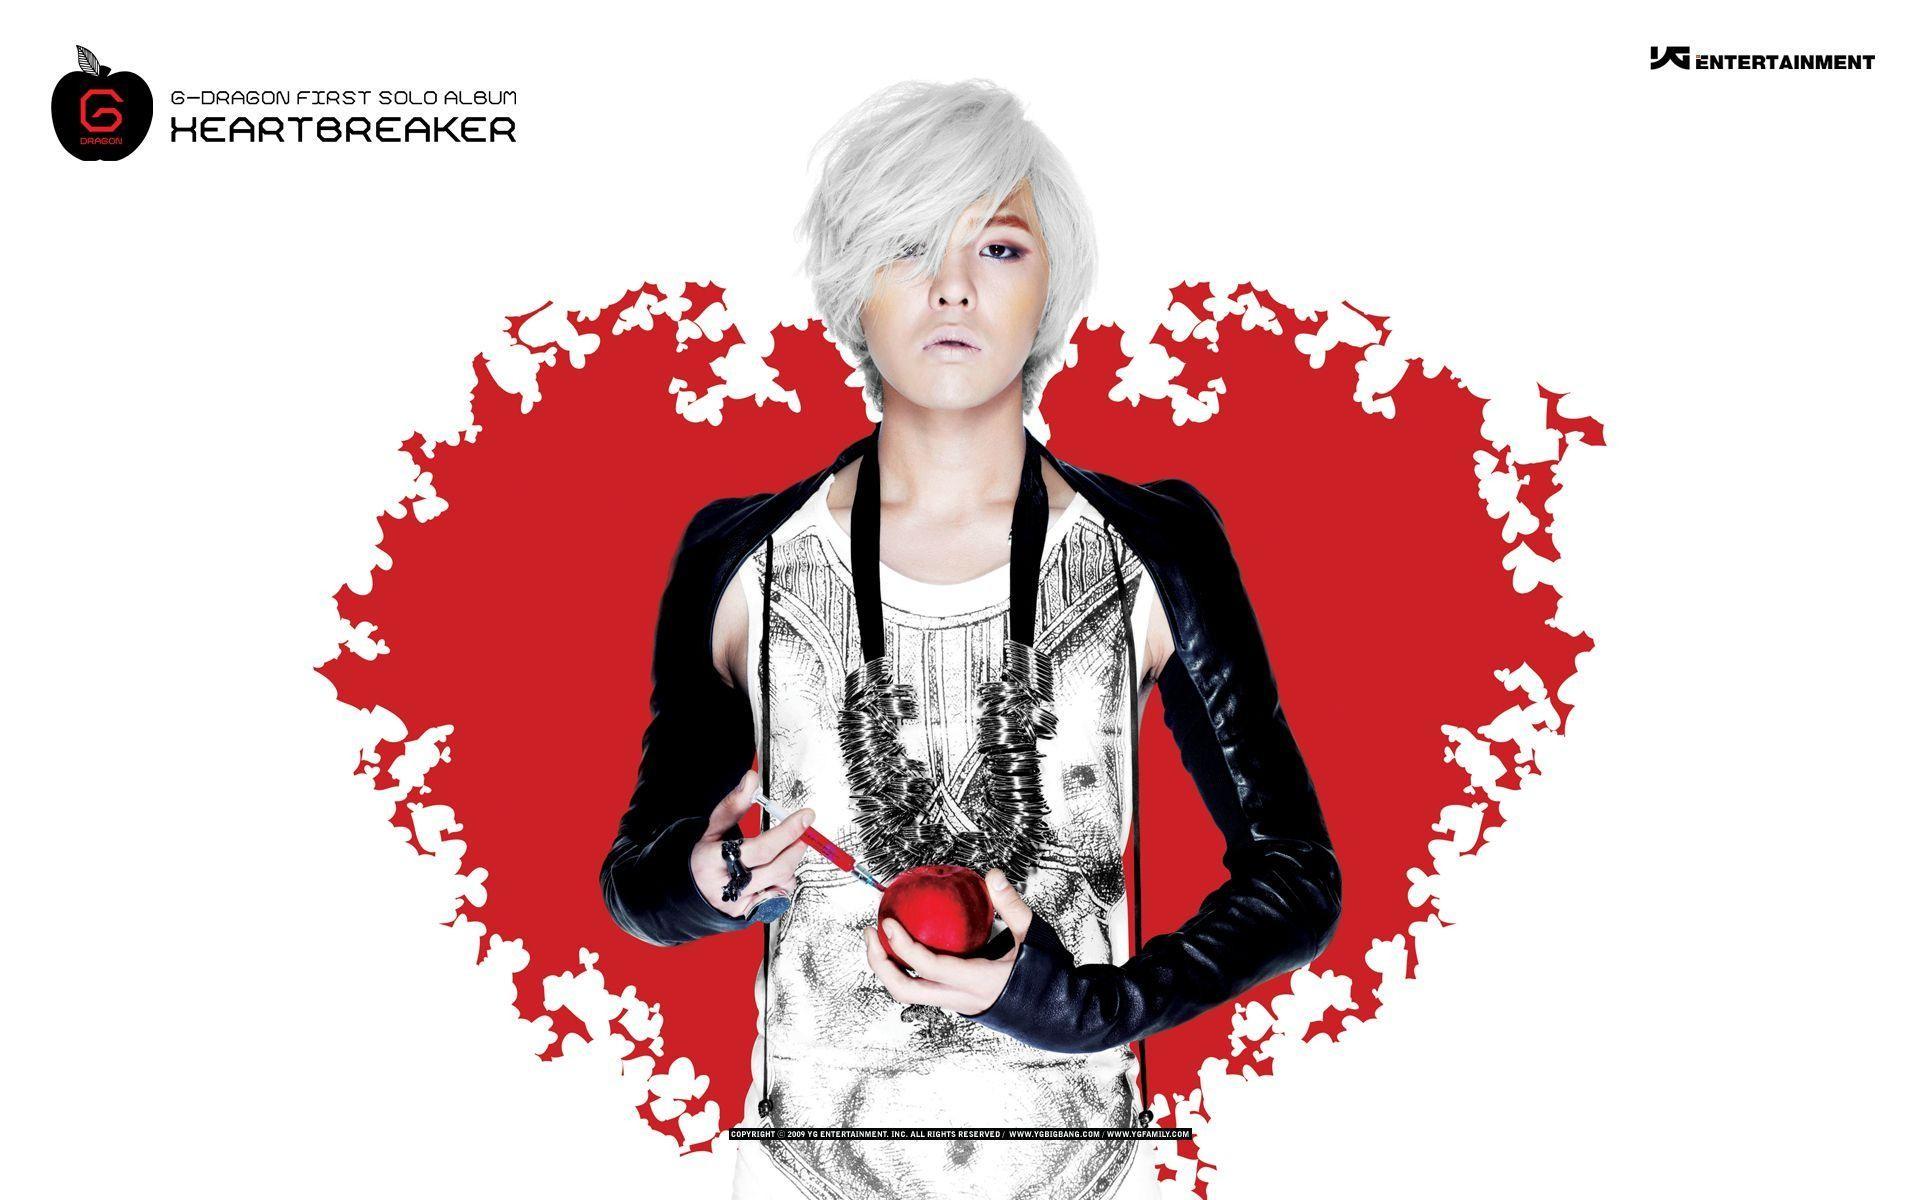 G Dragon Heartbreaker Wallpaper 72 Pictures